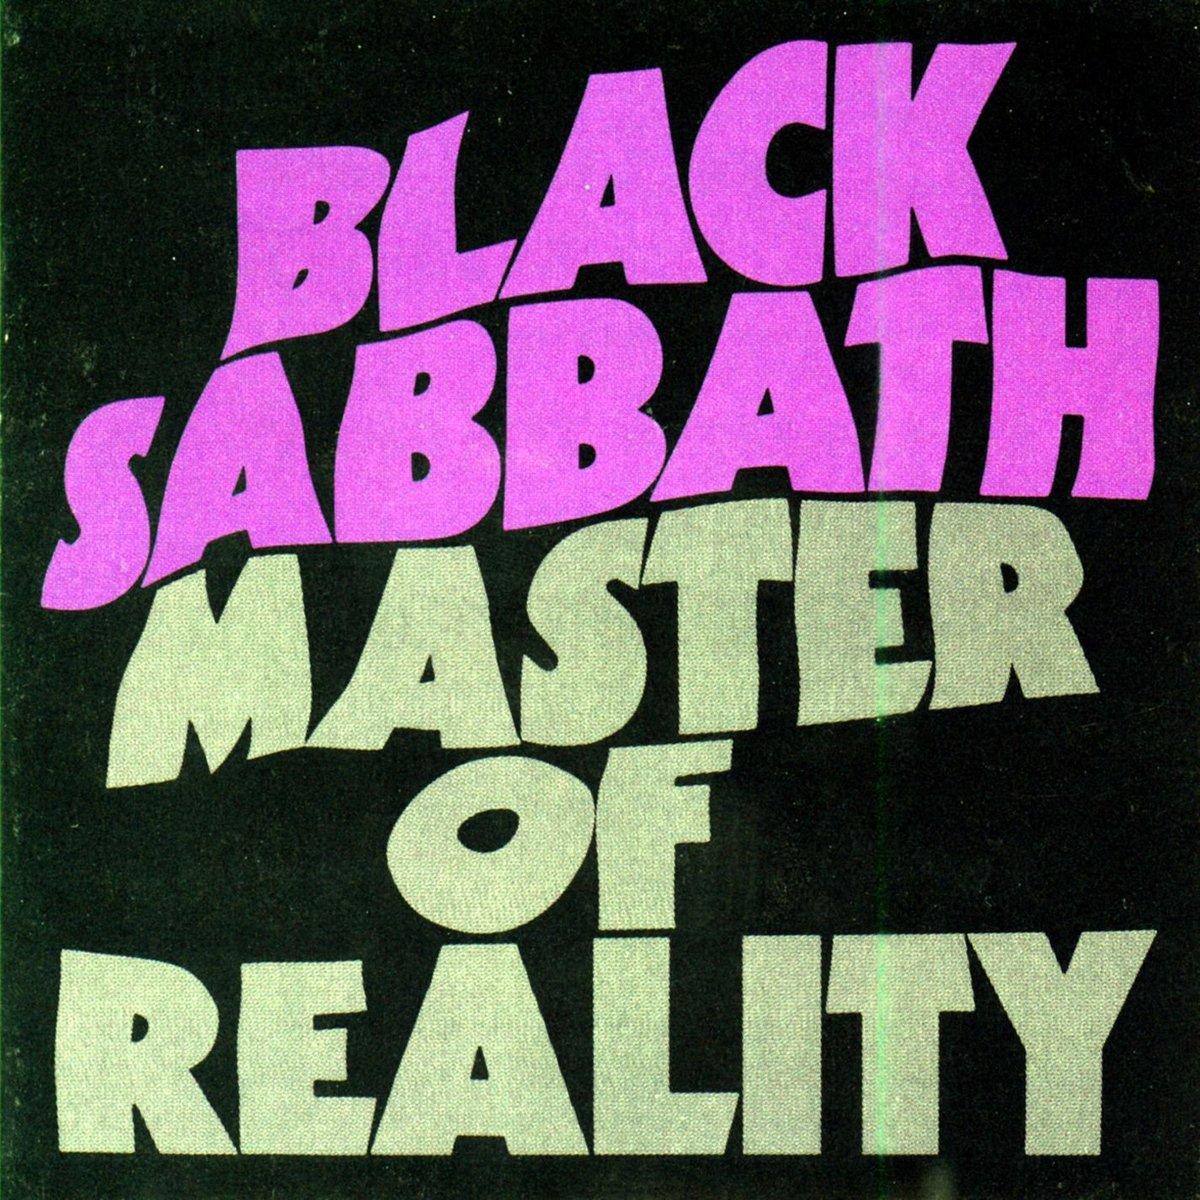 sabbath-masterofreality